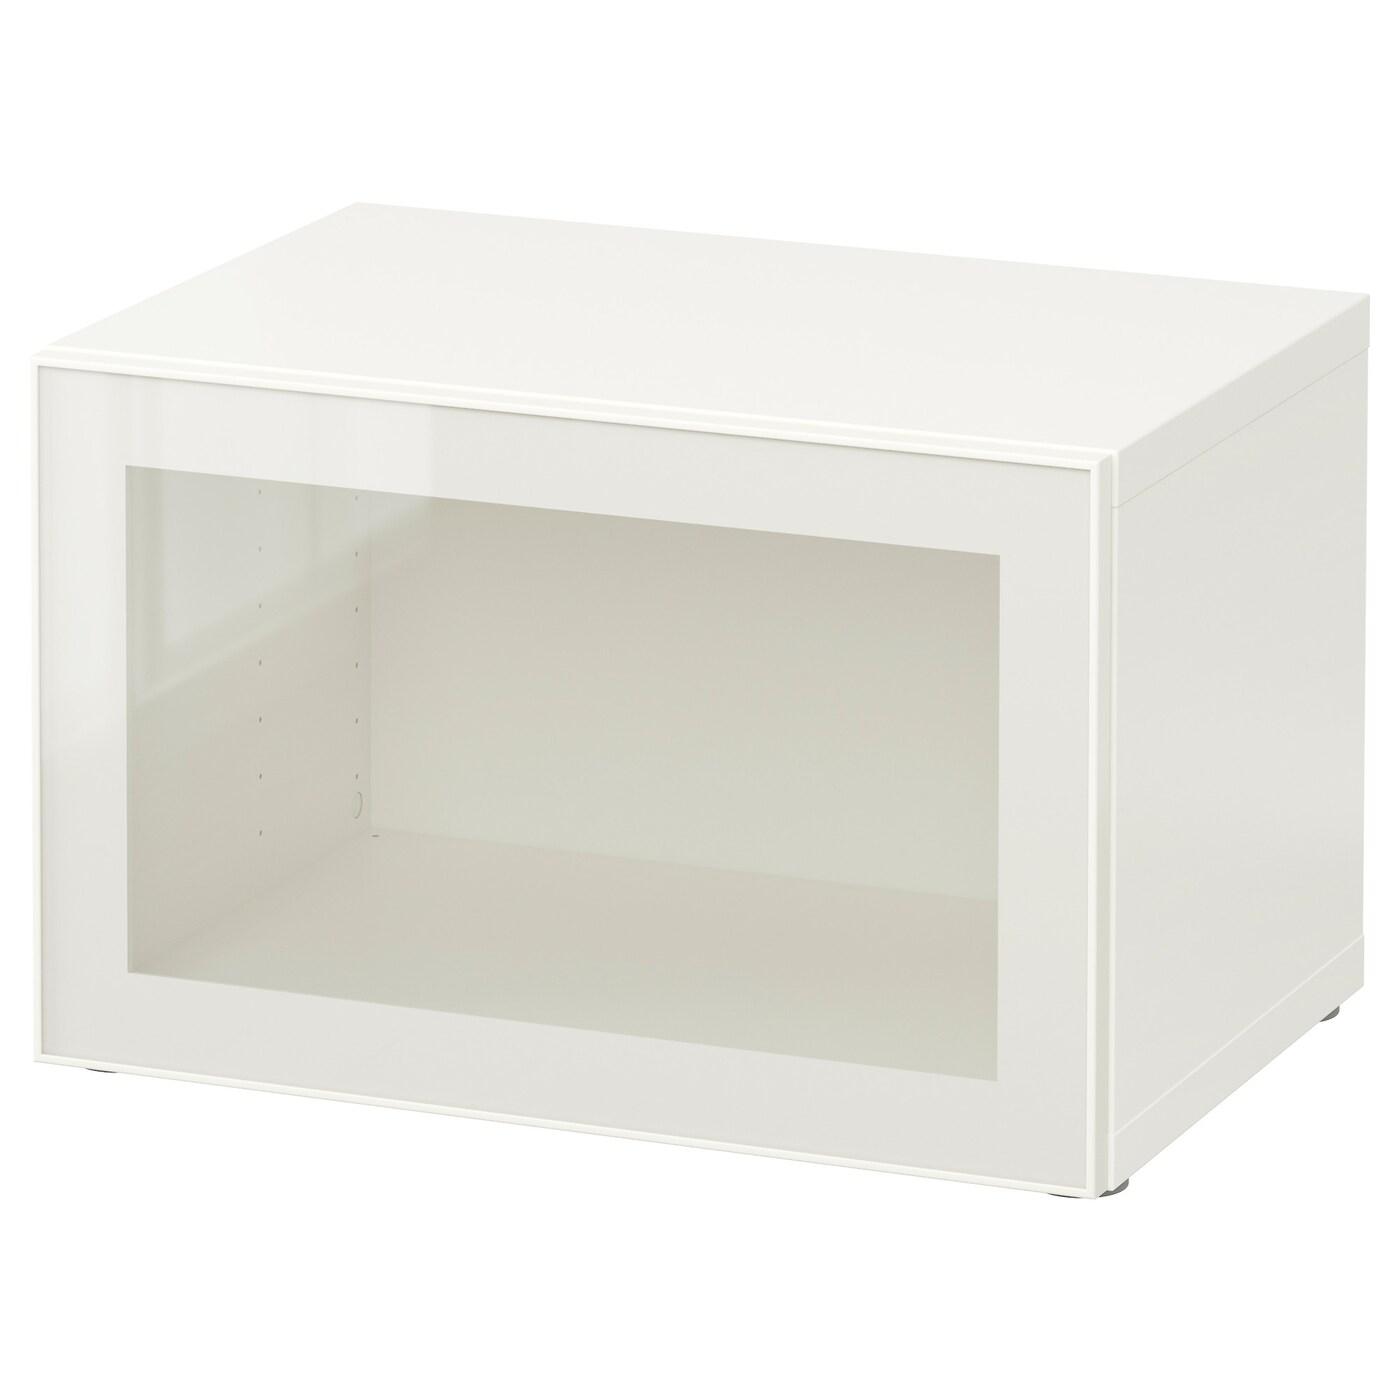 best tag re avec porte vitr e blanc glassvik blanc verre transparent 60x40x38 cm ikea. Black Bedroom Furniture Sets. Home Design Ideas